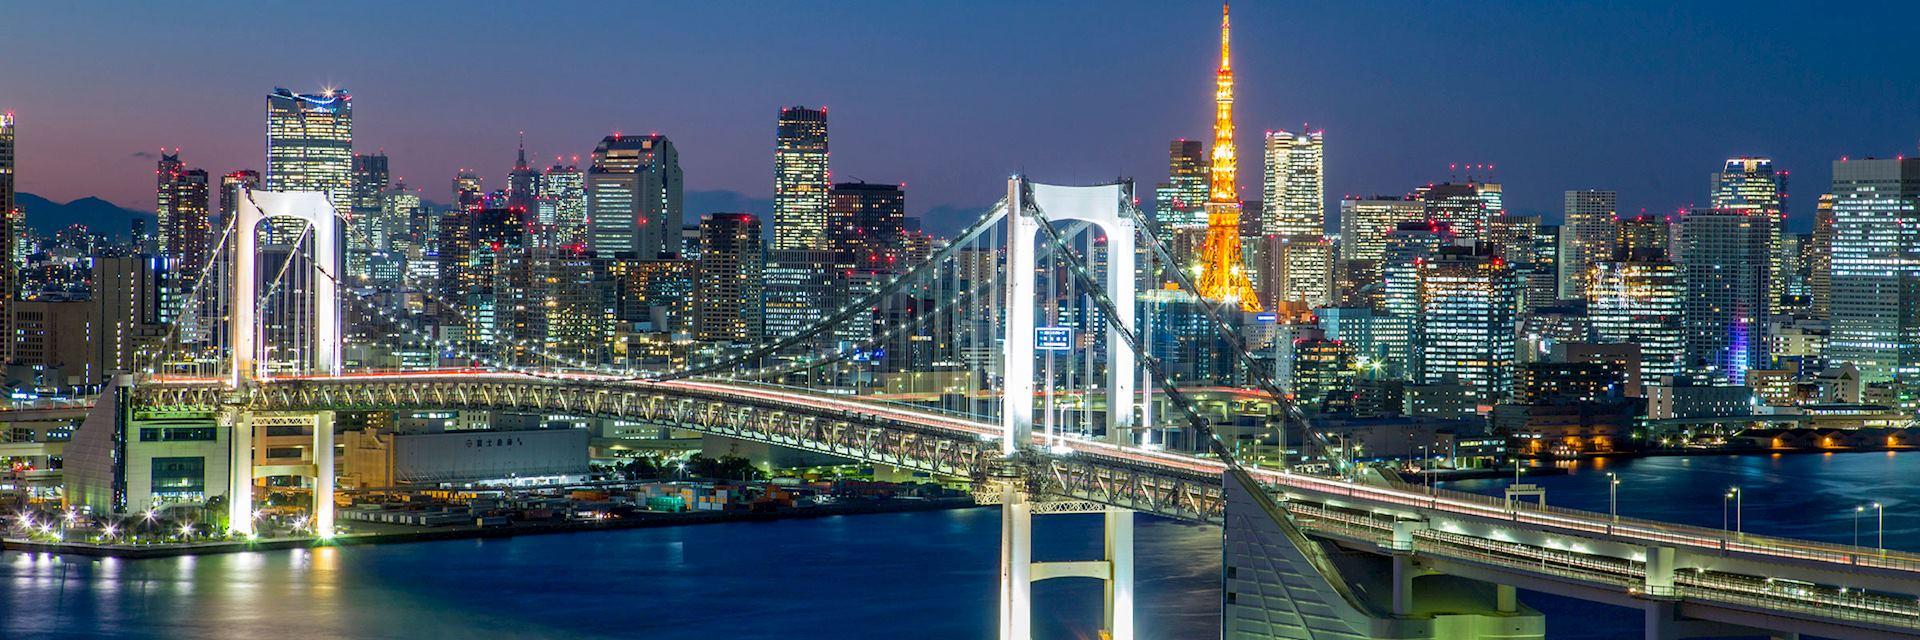 Tokyo Bay, Japan